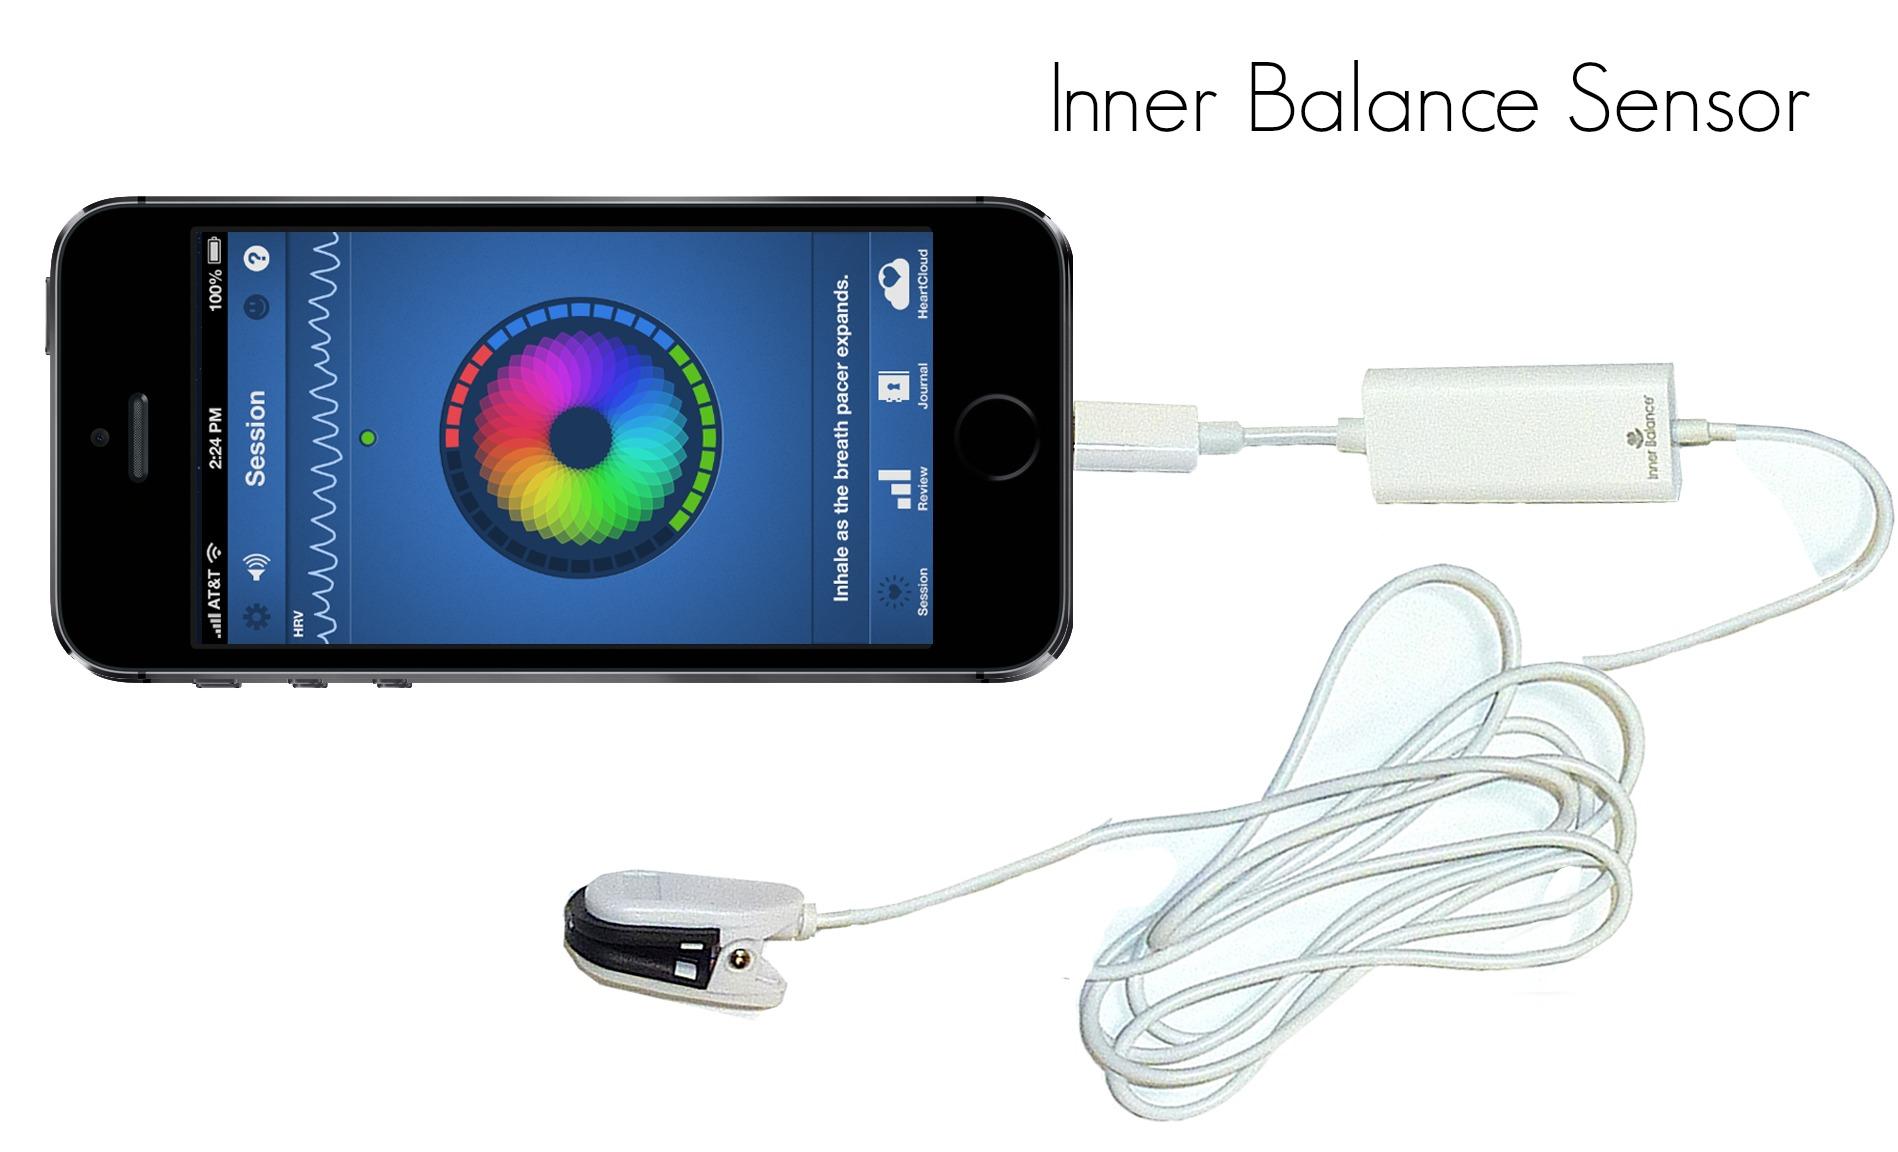 IB sensor